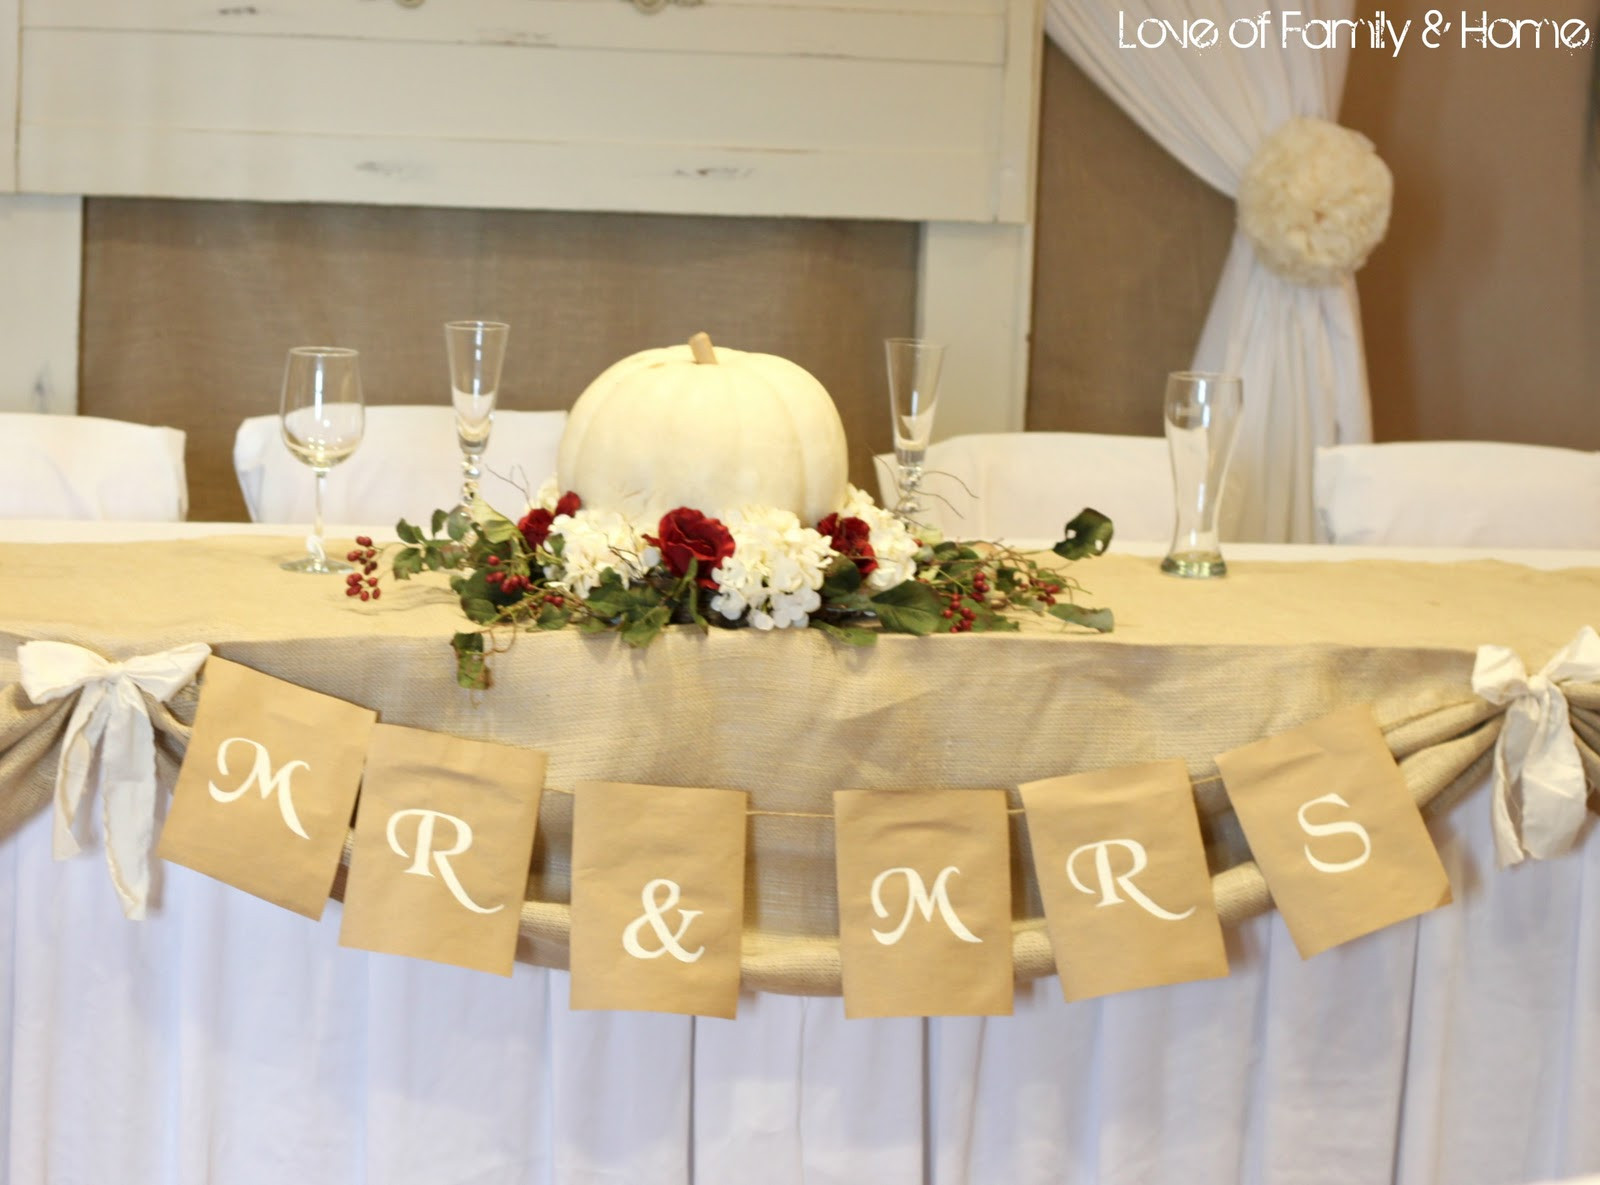 Wedding Decor DIY  DIY Rustic Chic Fall Wedding Reveal Love of Family